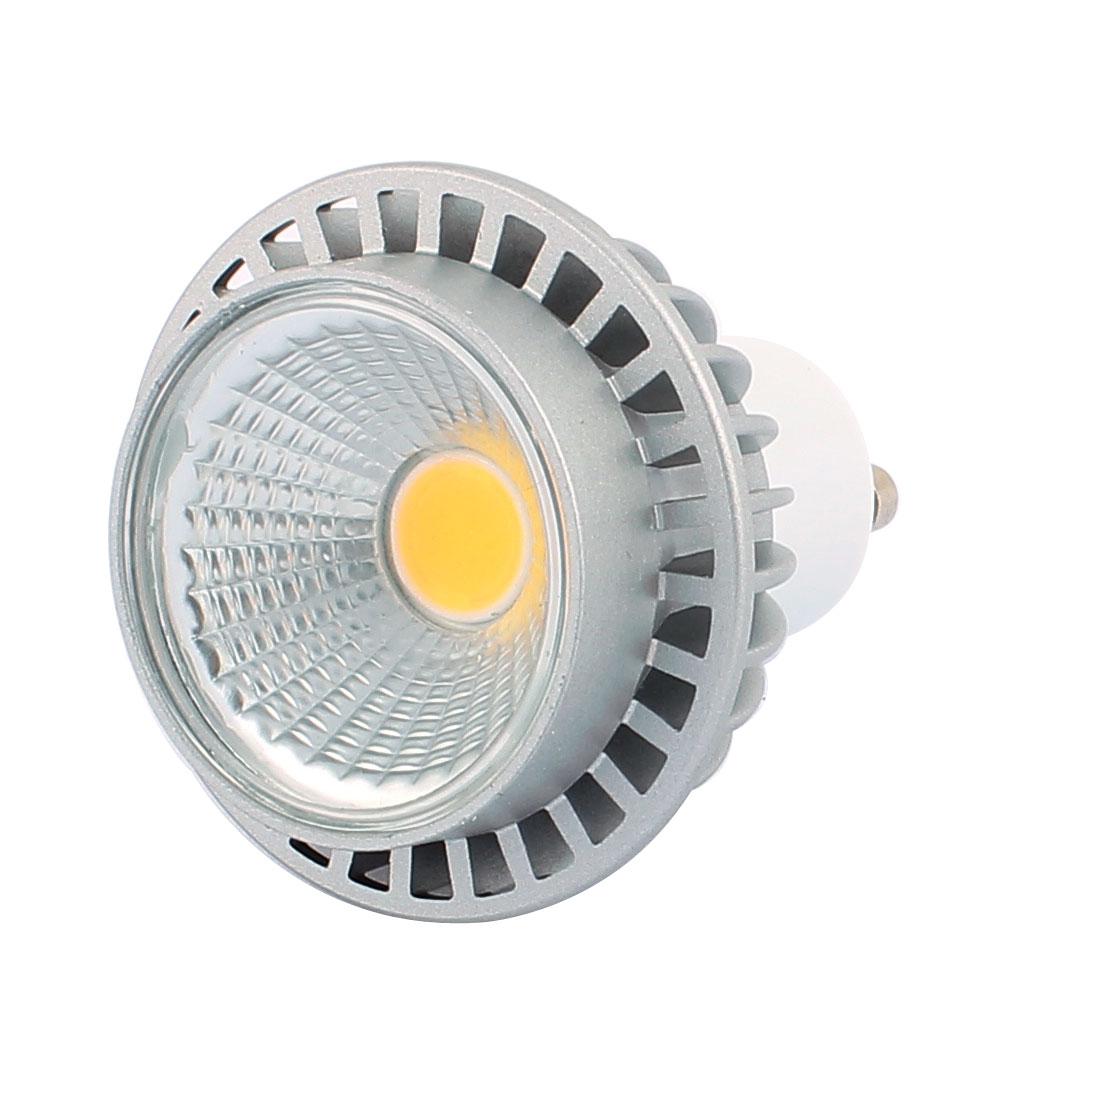 AC85-265V 3W GU10 COB LED 240LM Spotlight Lamp Bulb Downlight Pure White